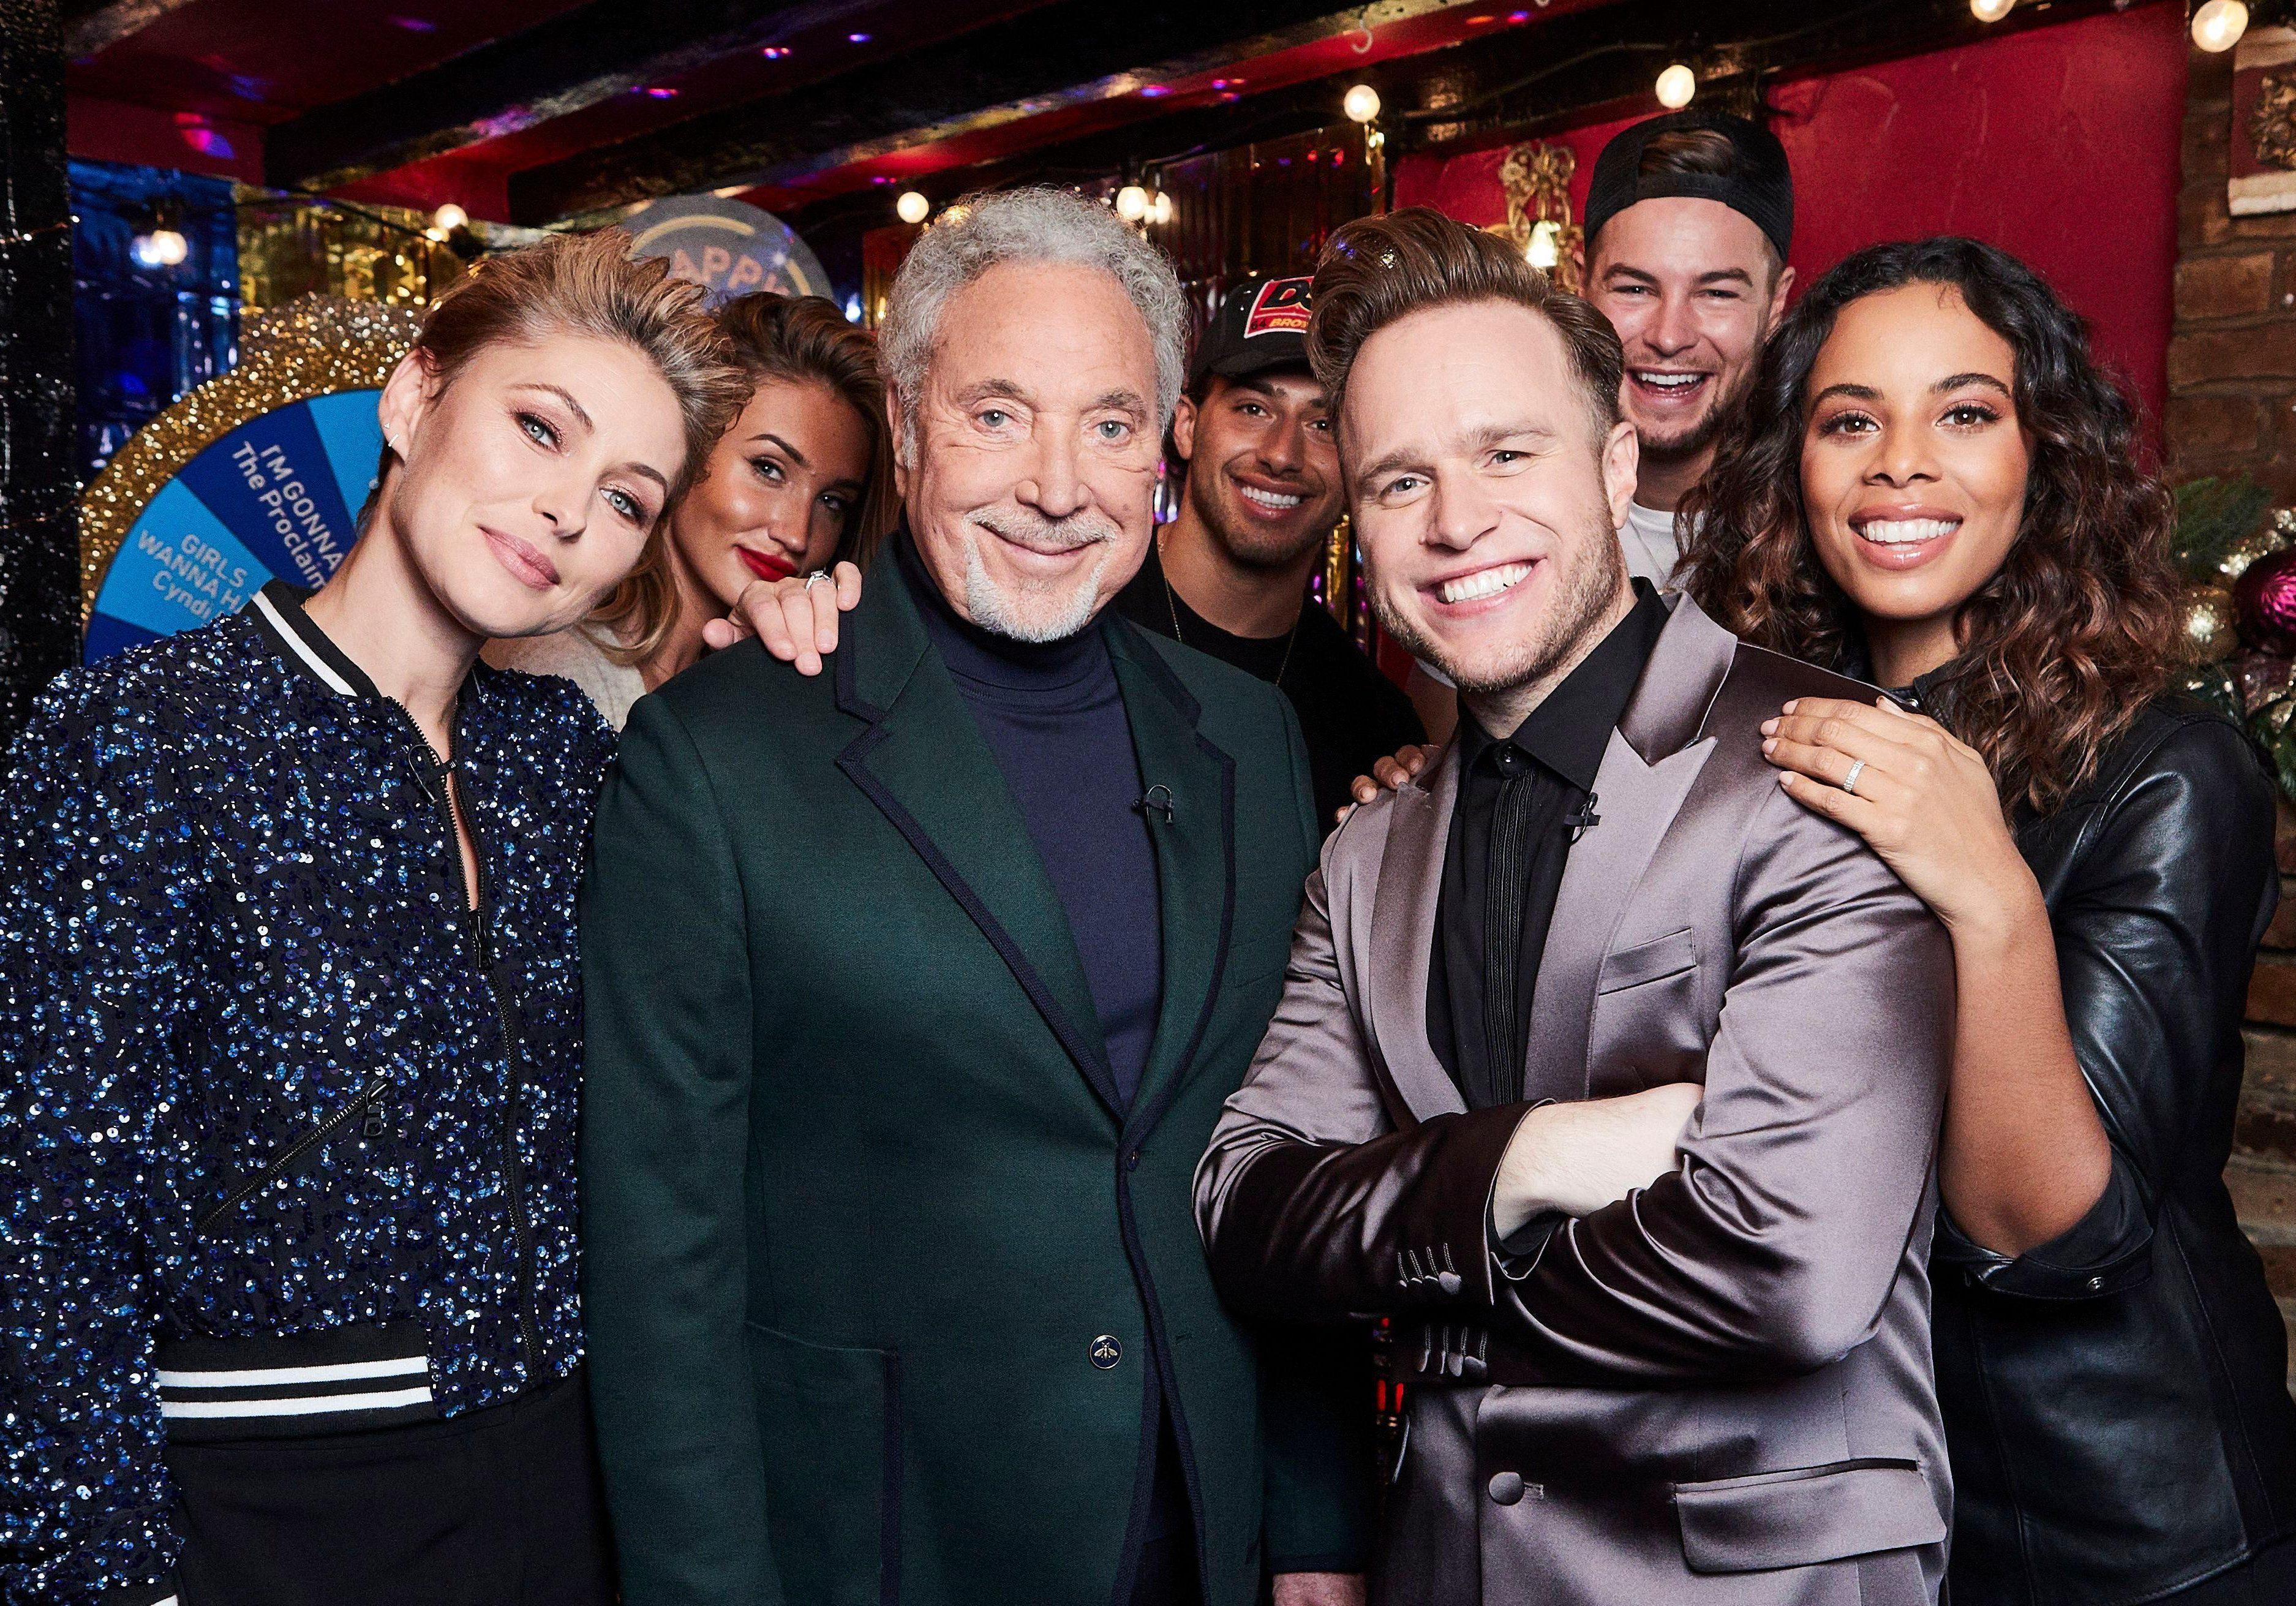 Olly Murs sings karaoke with Bradley Walsh, Sir Tom Jones and Emma Willis as he lands his own Christmas TV special